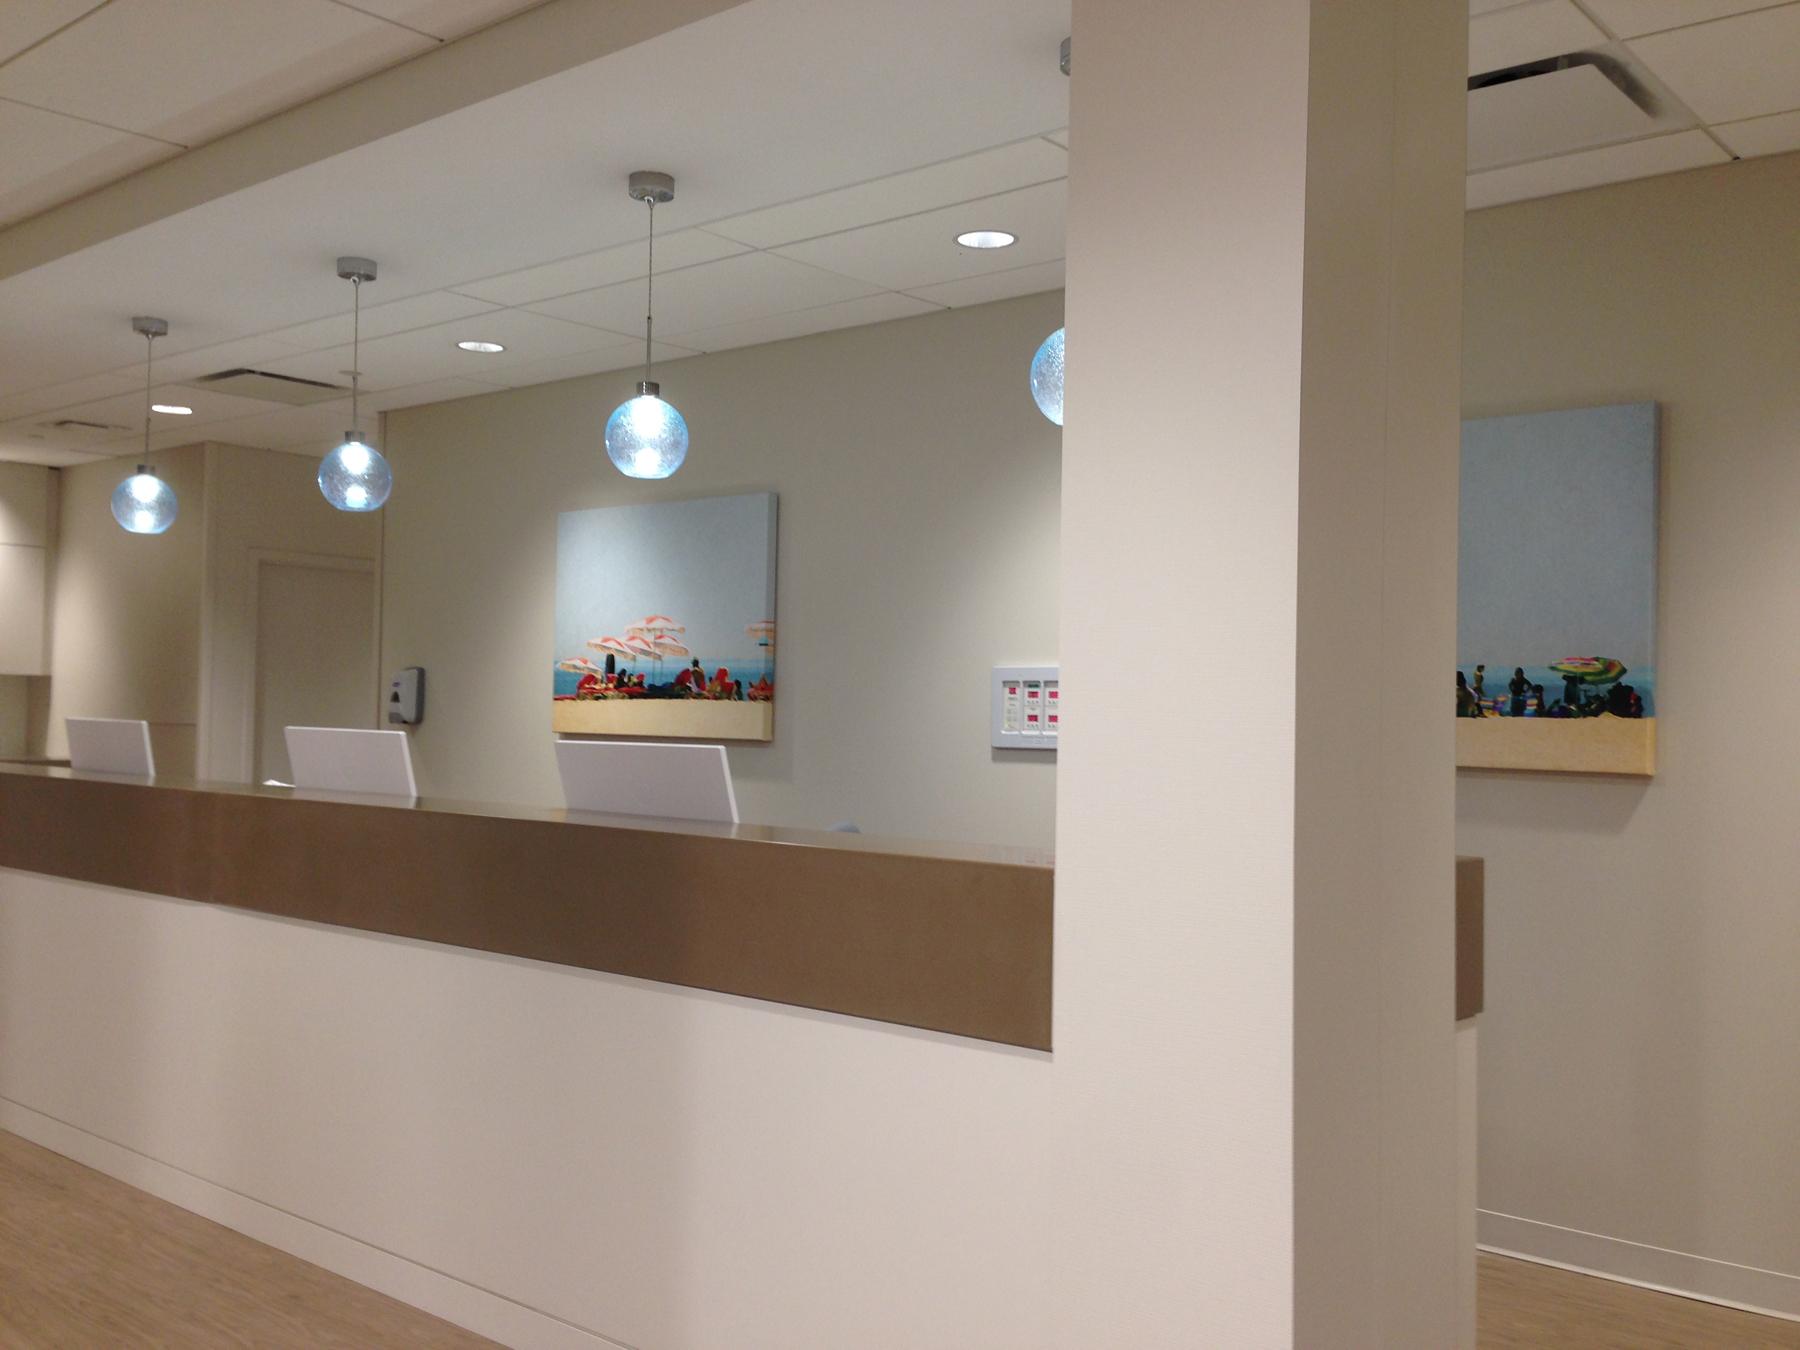 Northwell Health Imbert Cancer Center